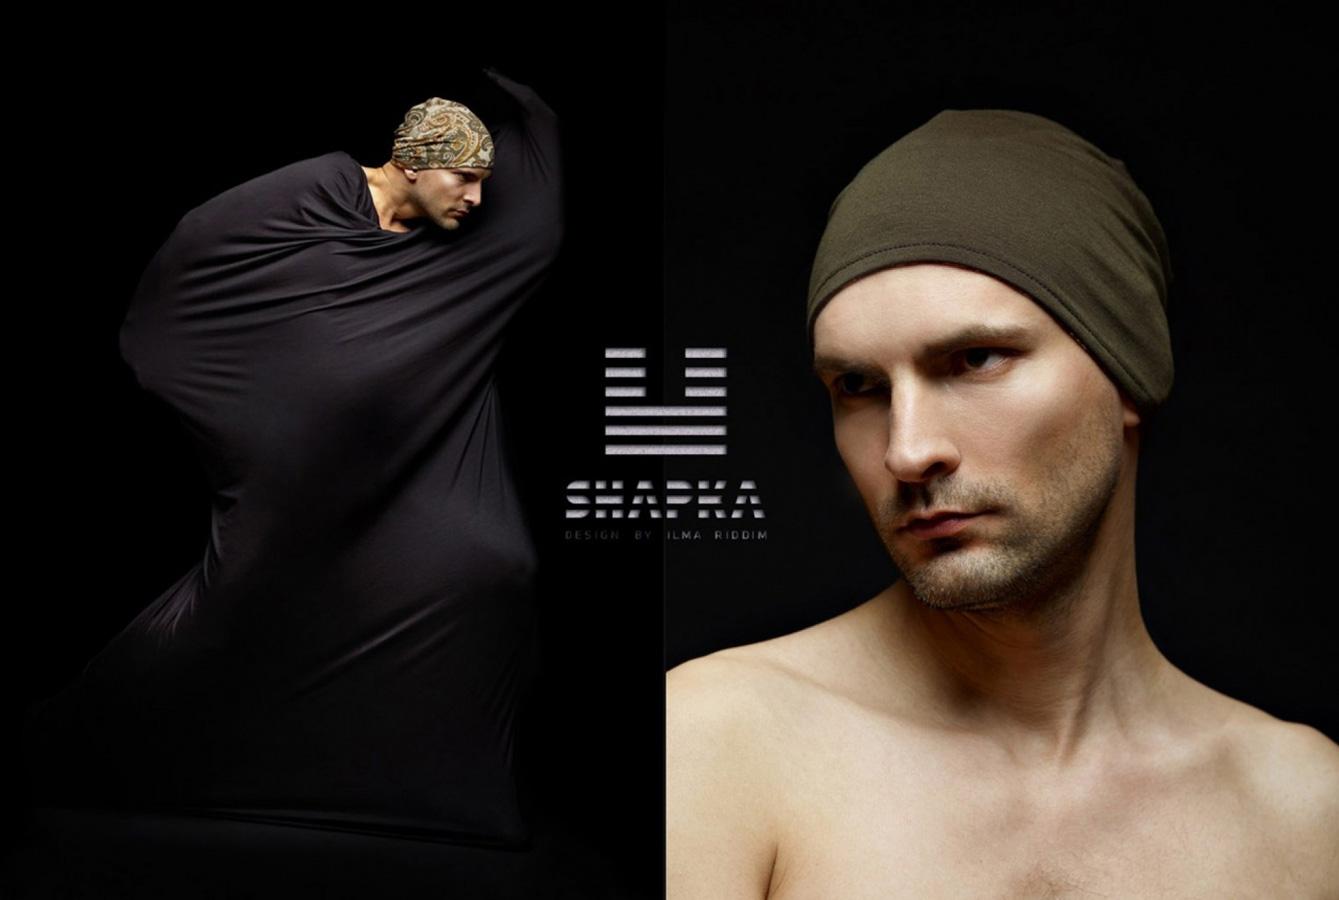 shapka-18532_col8_wlogo. Фотосъемка одежды, фотограф Лена Волкова